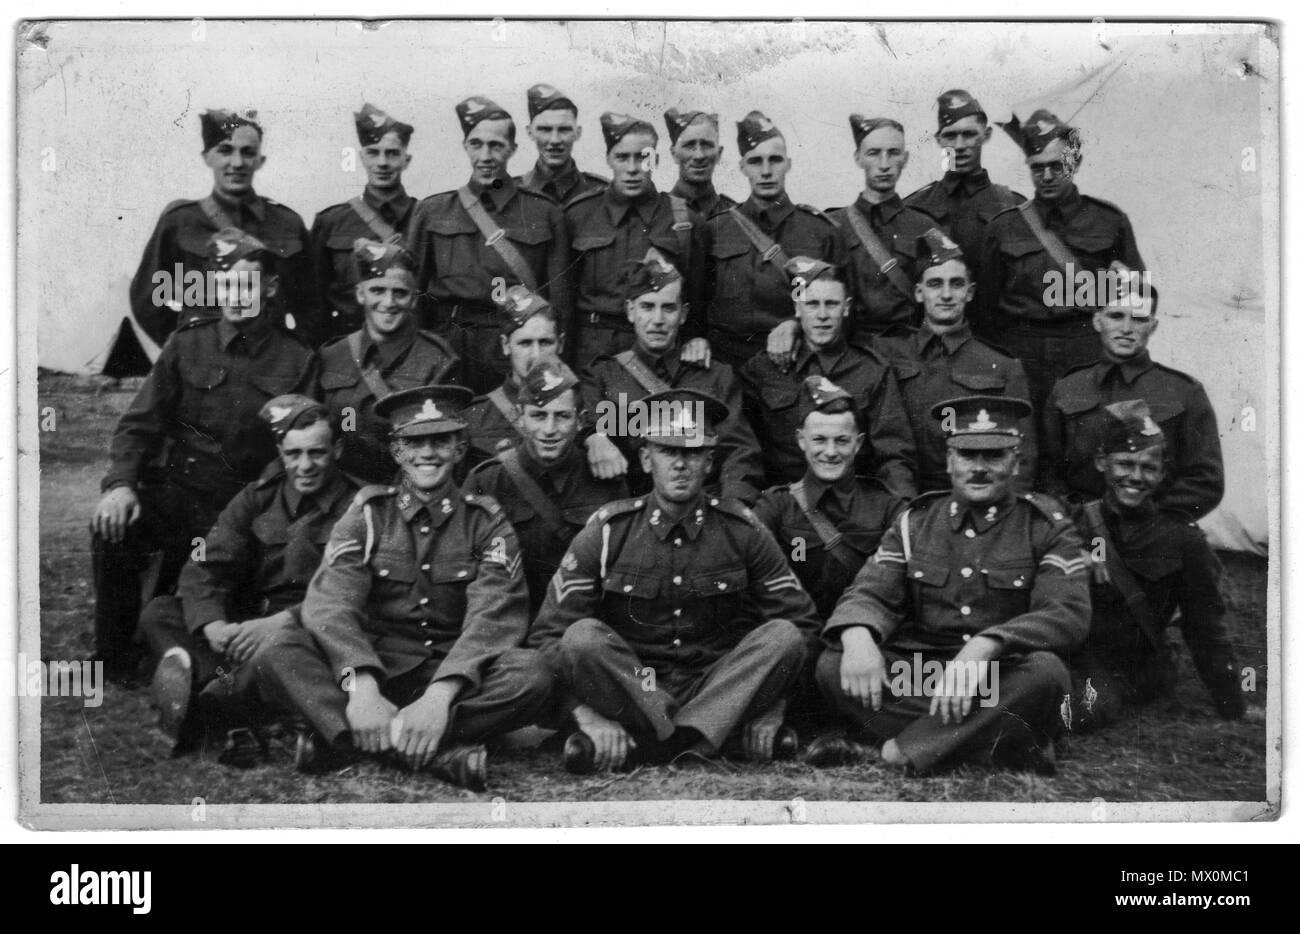 Group Photo of part of 68 Medium Regiment Royal Artillery, 233 Battery, 1939 UK, Second world War - Stock Image